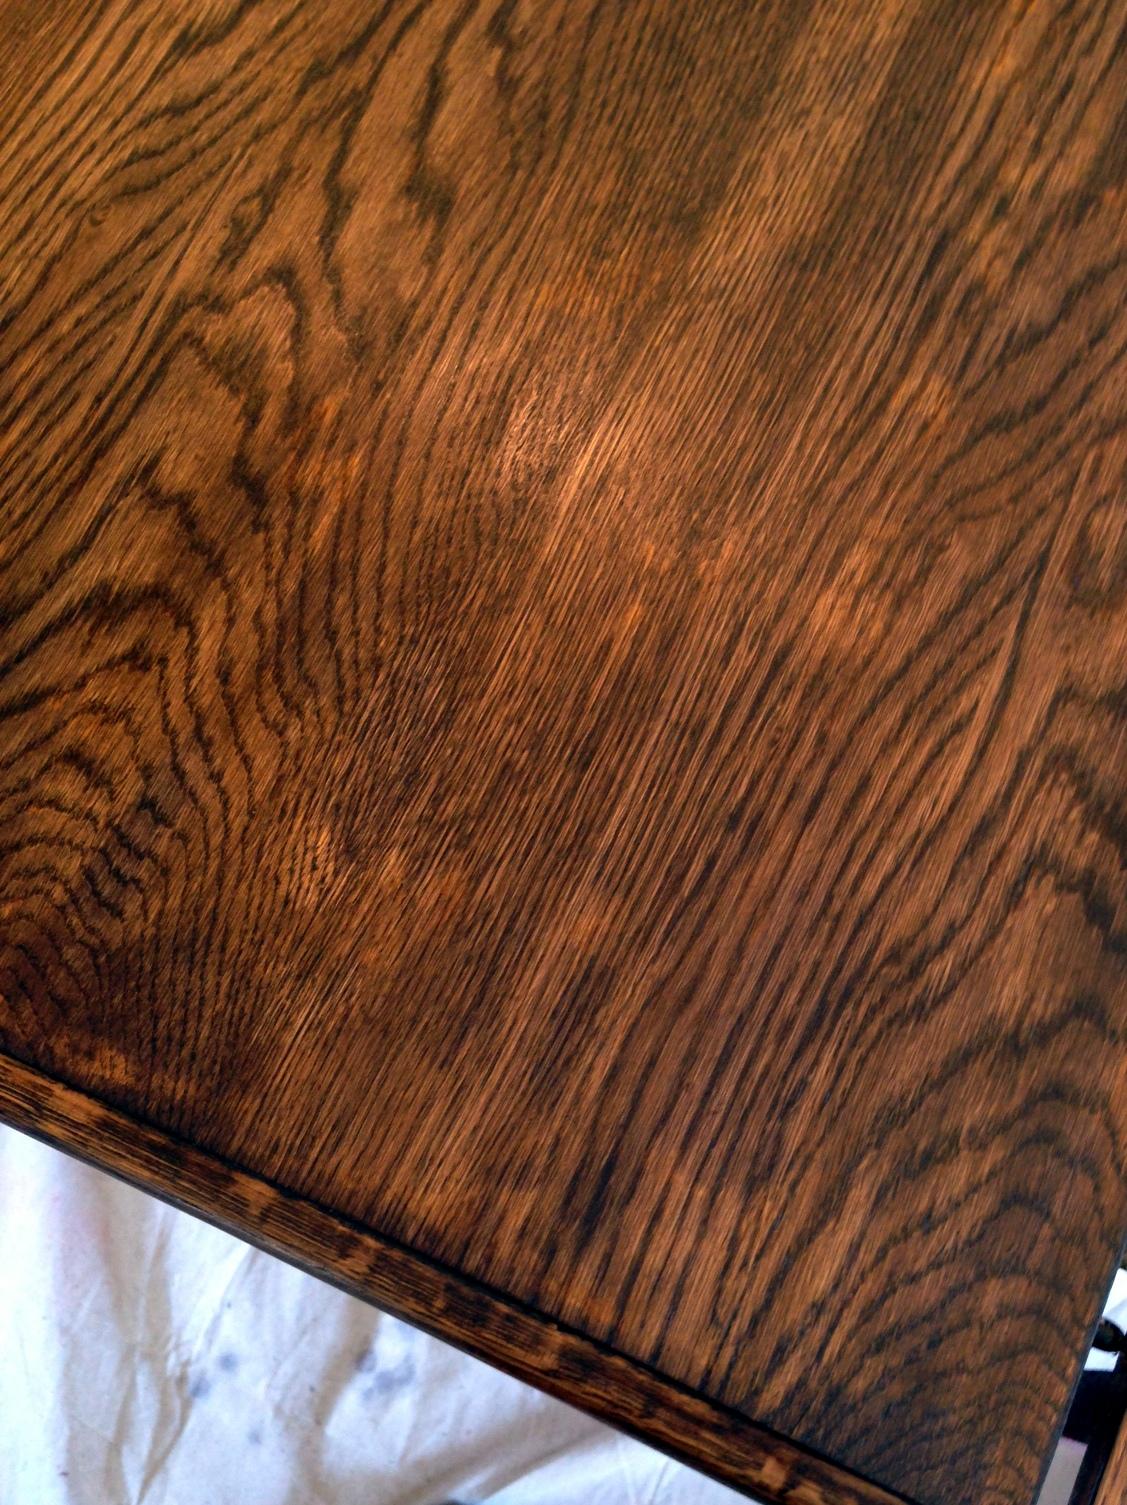 oak-table-turned-farmhouse-table-blotchy-finish.jpg